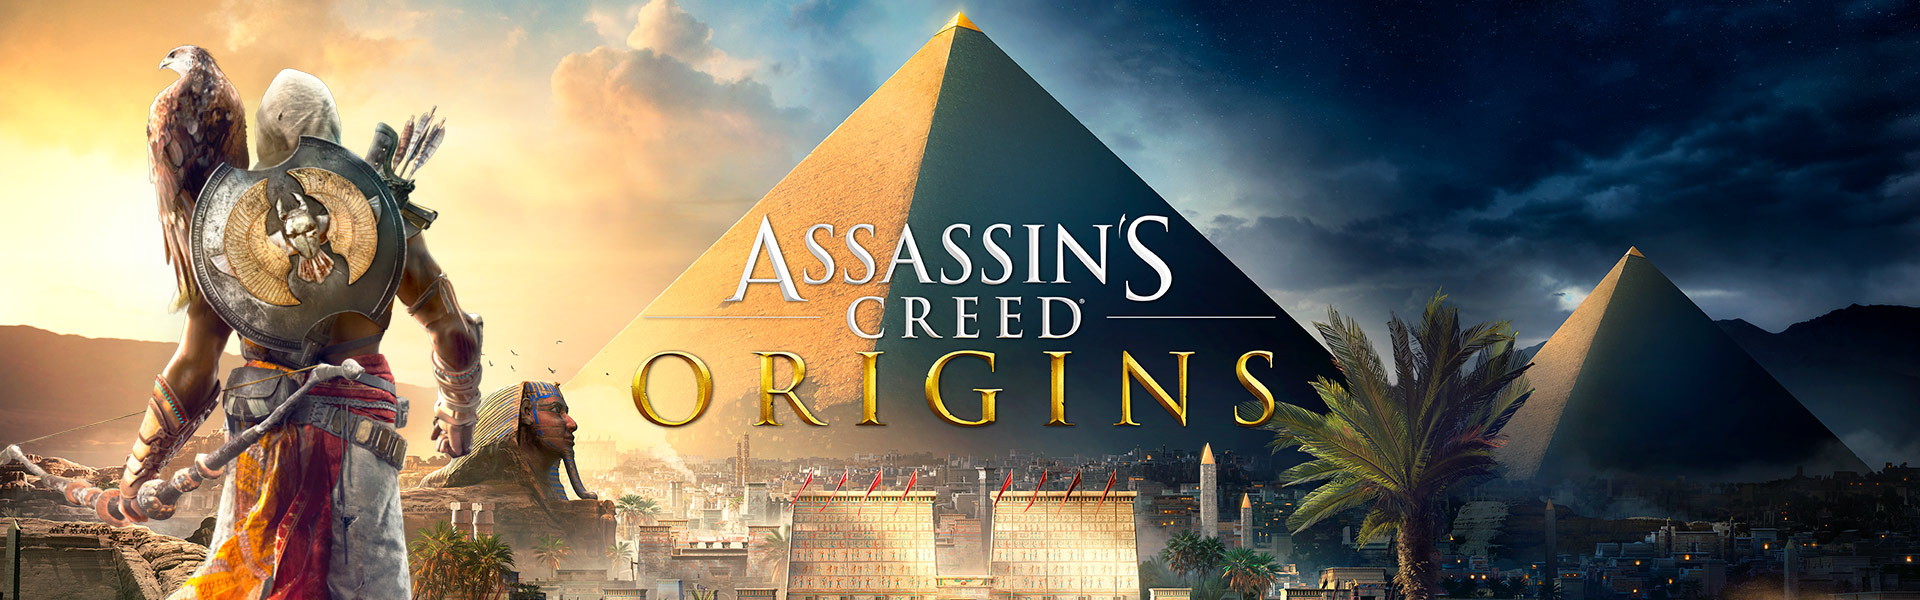 Assassin's Creed Origins !